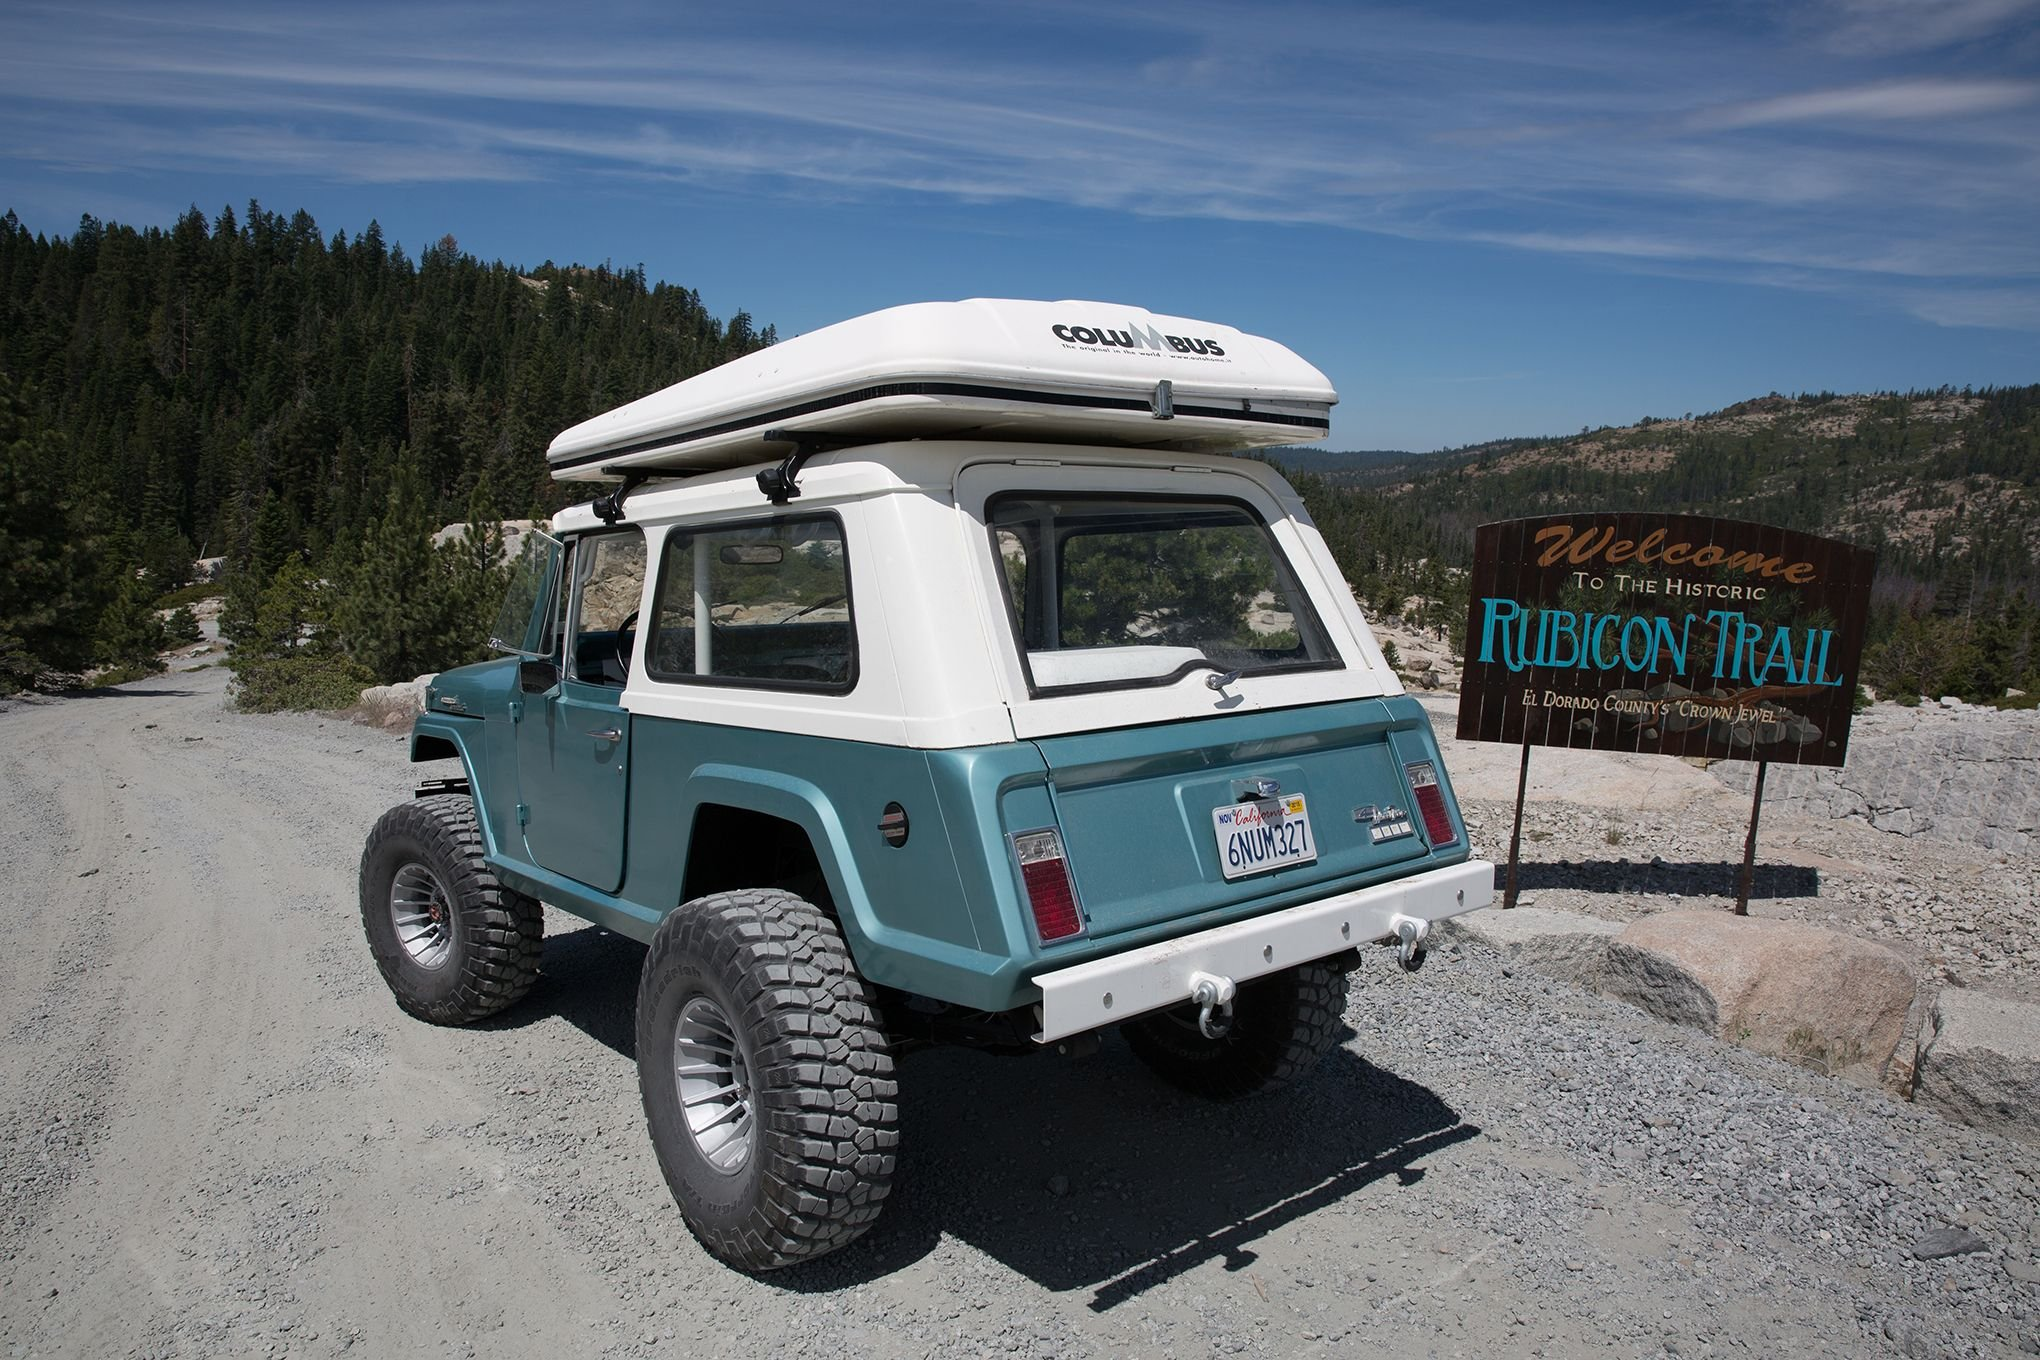 1970 Jeep Jeepster Commando offroad 4x4 custom truck wallpaper ...